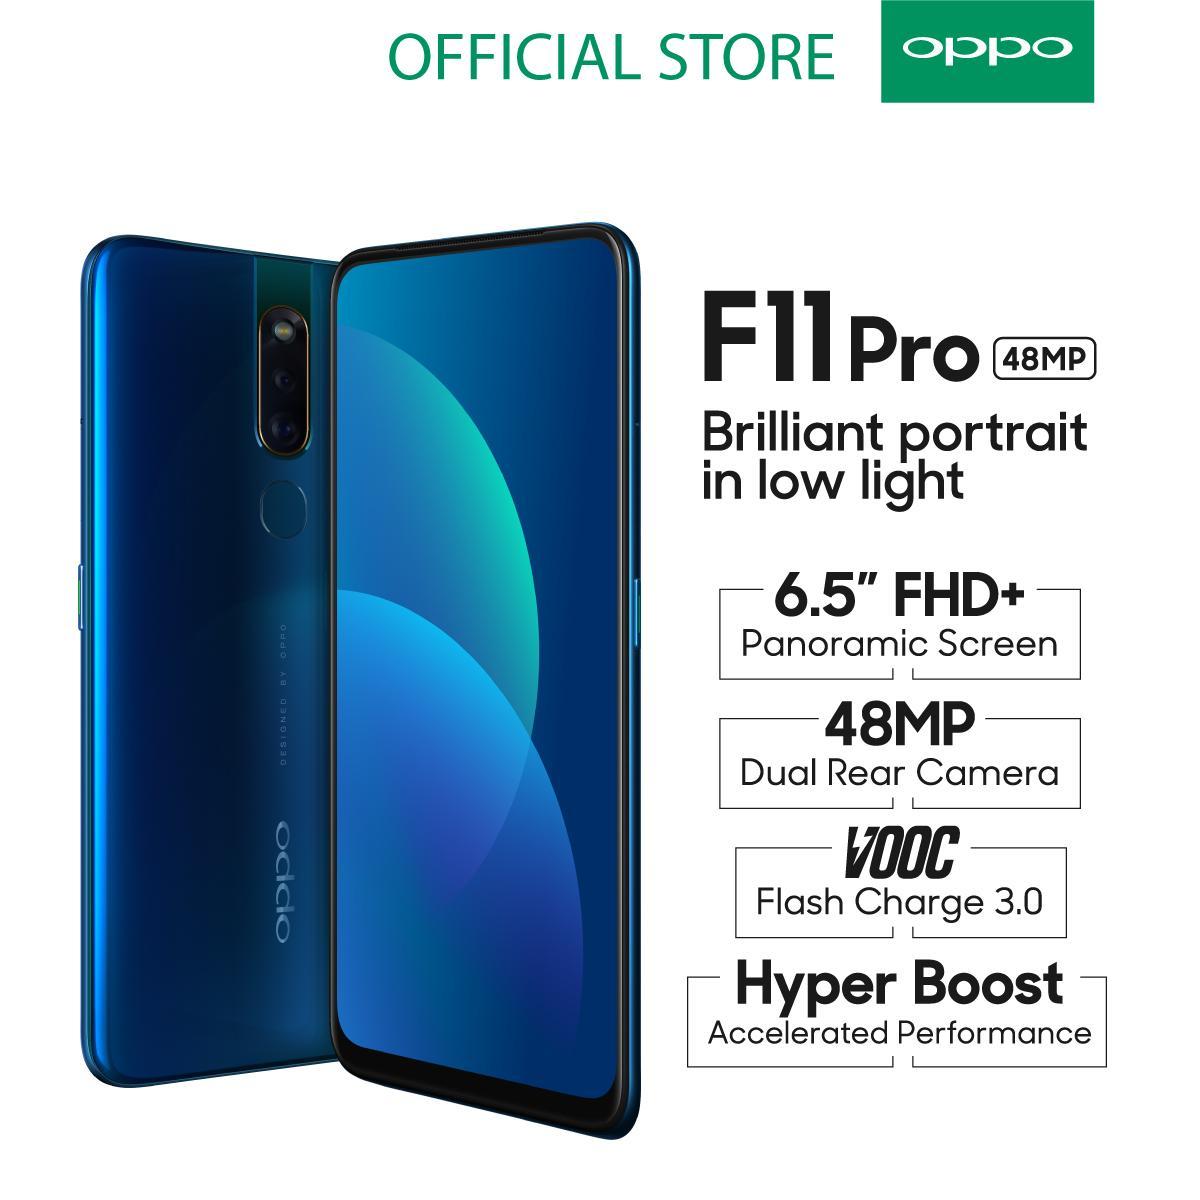 OPPO F11 Pro Smartphone 6 GB / 64 GB 48 MP Low Light Camera